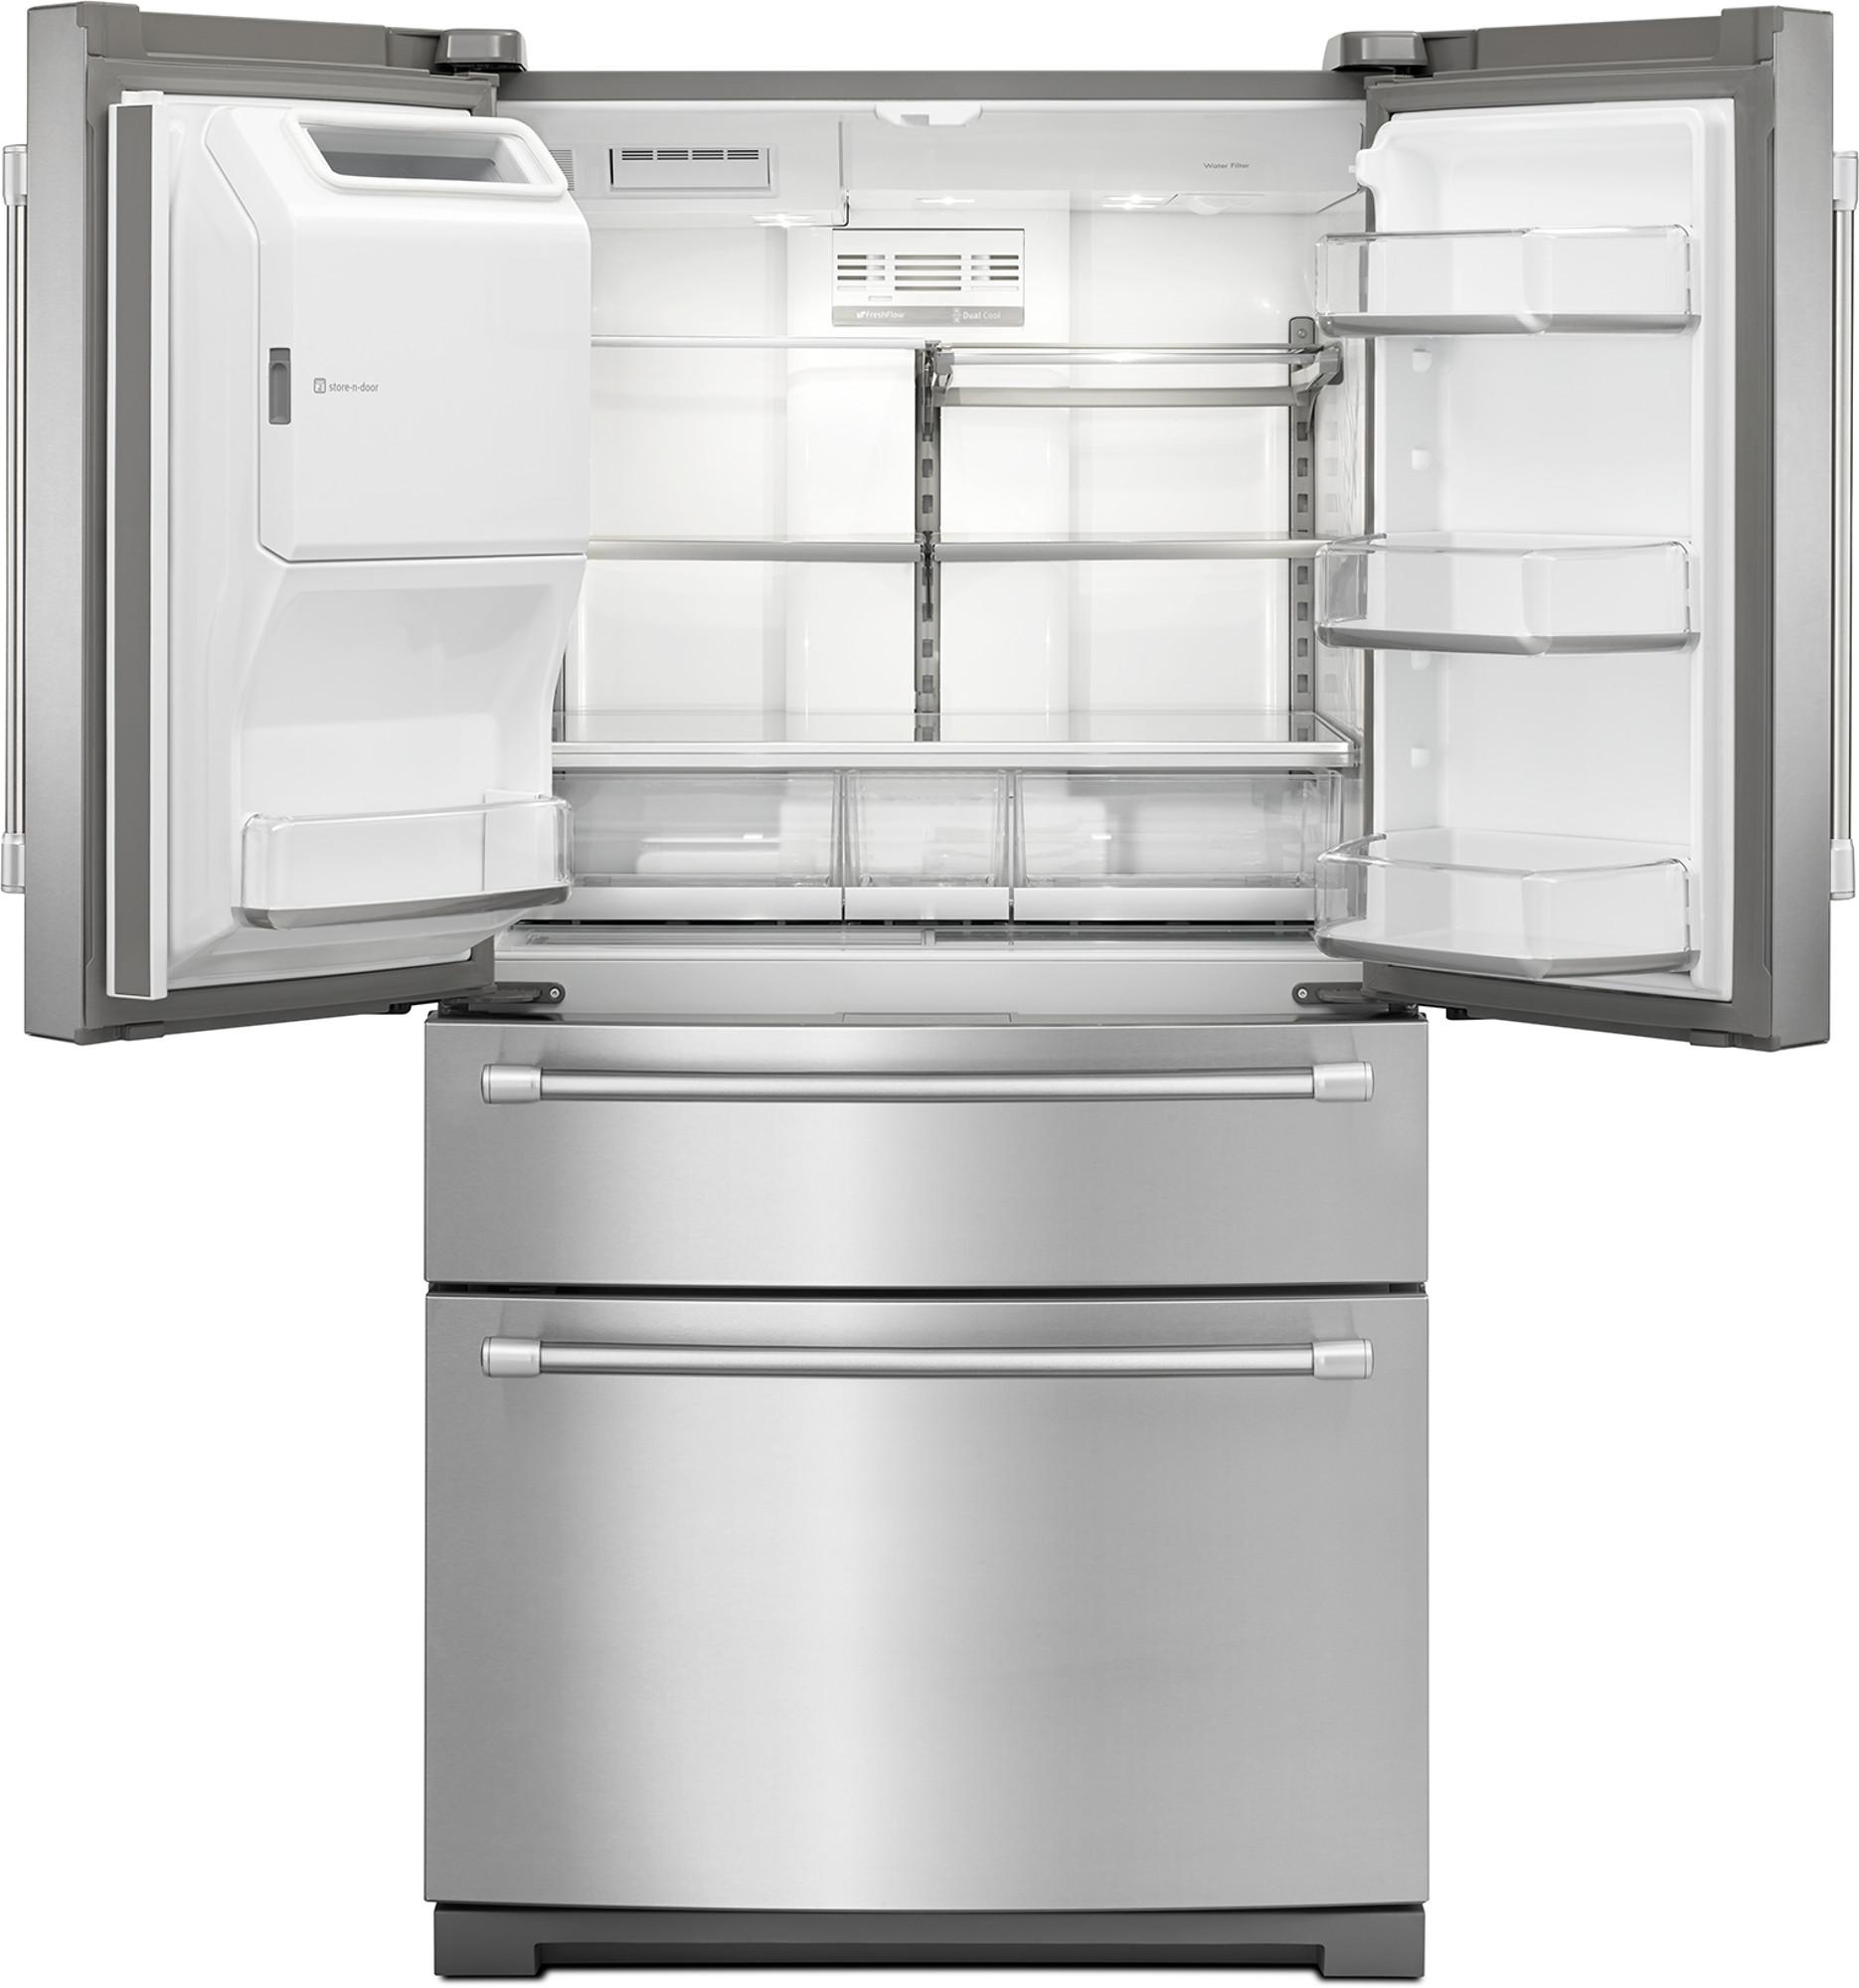 Maytag MFX2876DRM 26 cu. ft. 4-Door French Door Bottom Freezer Refrigerator w/ Steel Shelves - Stainless Steel